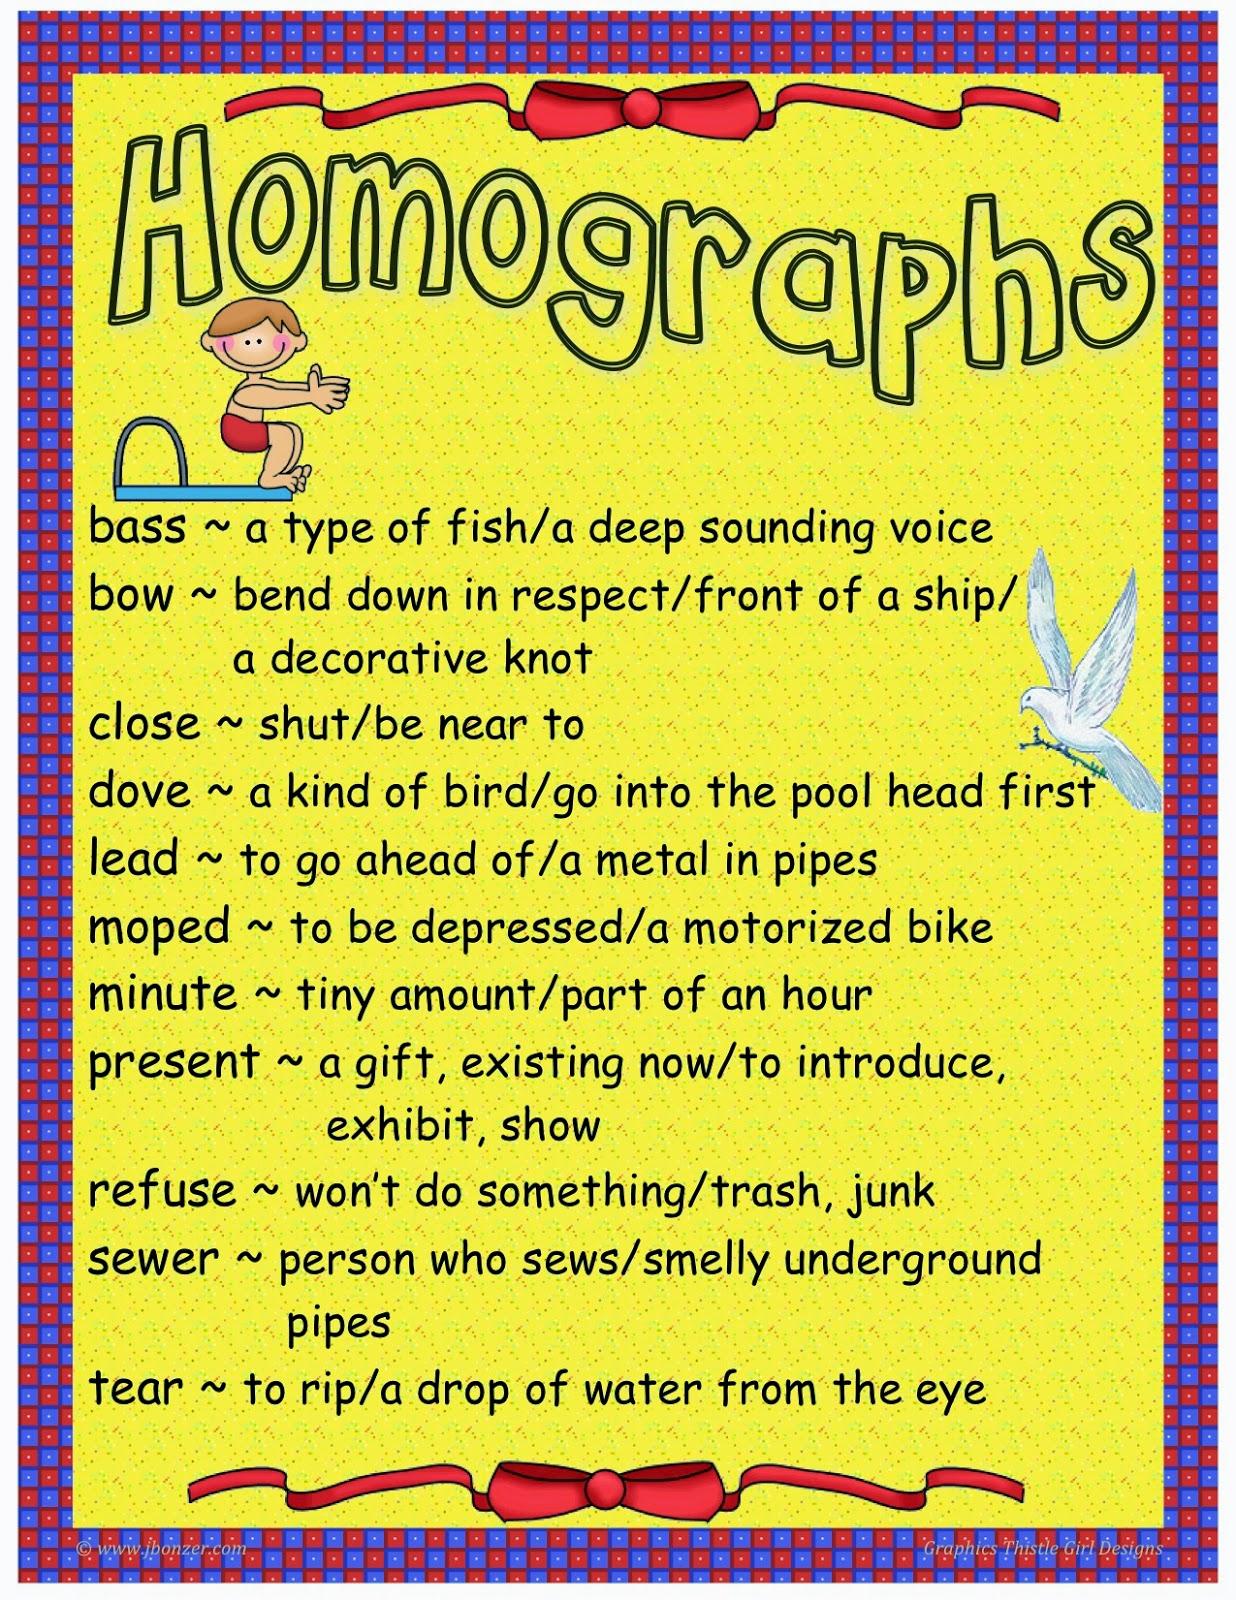 Wise Wednesday Grammar Homographs Native English Spain